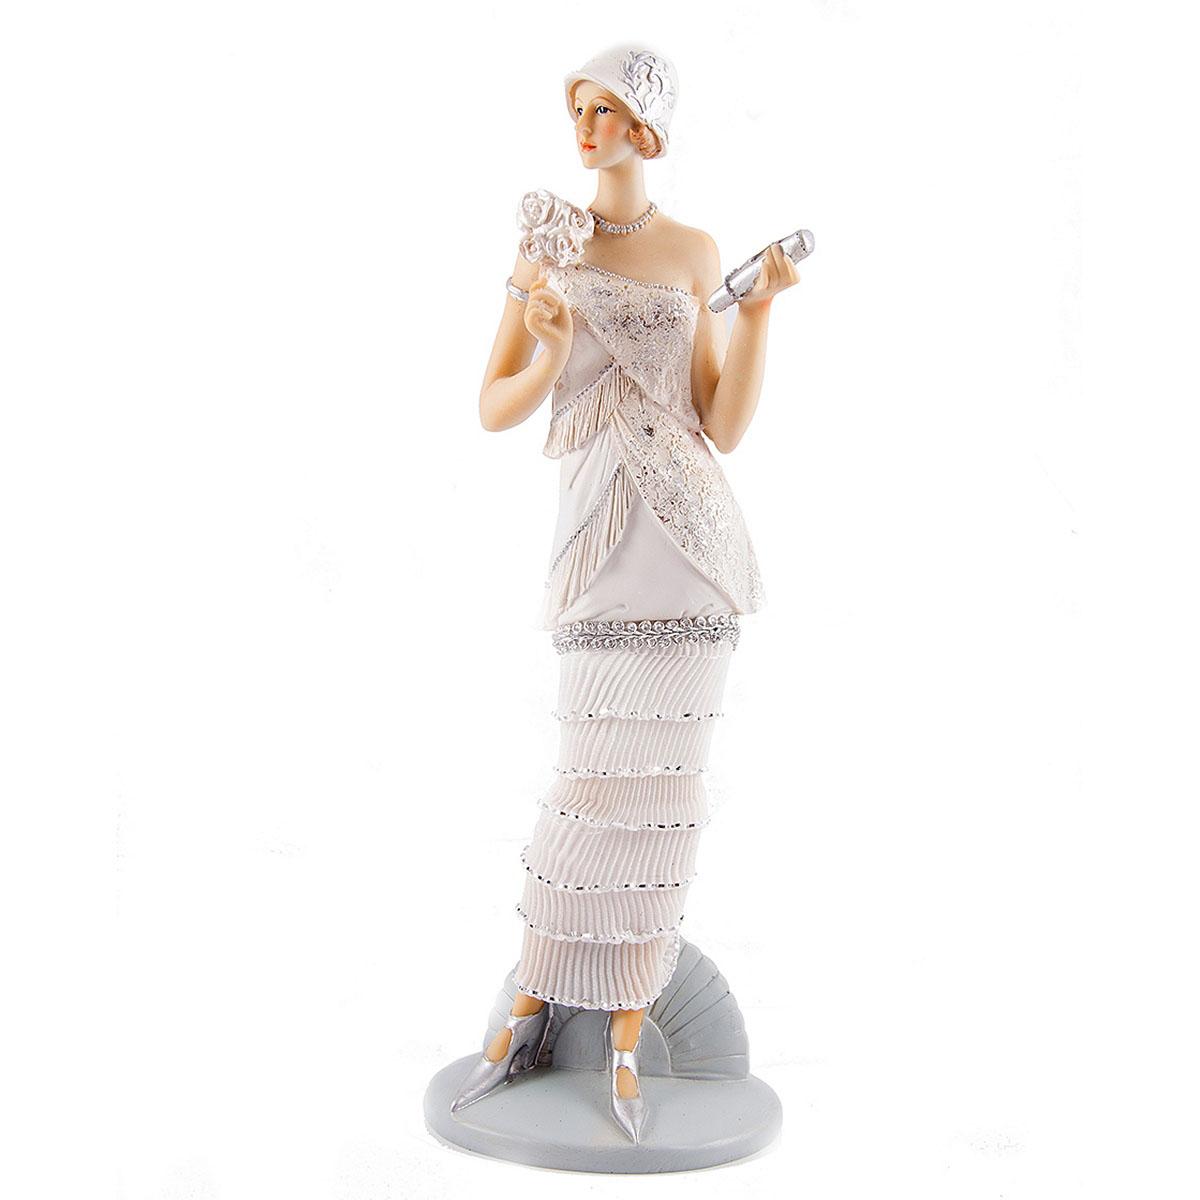 Статуэтка Русские Подарки Мисс Обаяние, 12 х 10 х 34 см статуэтка русские подарки африканка 6 х 11 х 20 см